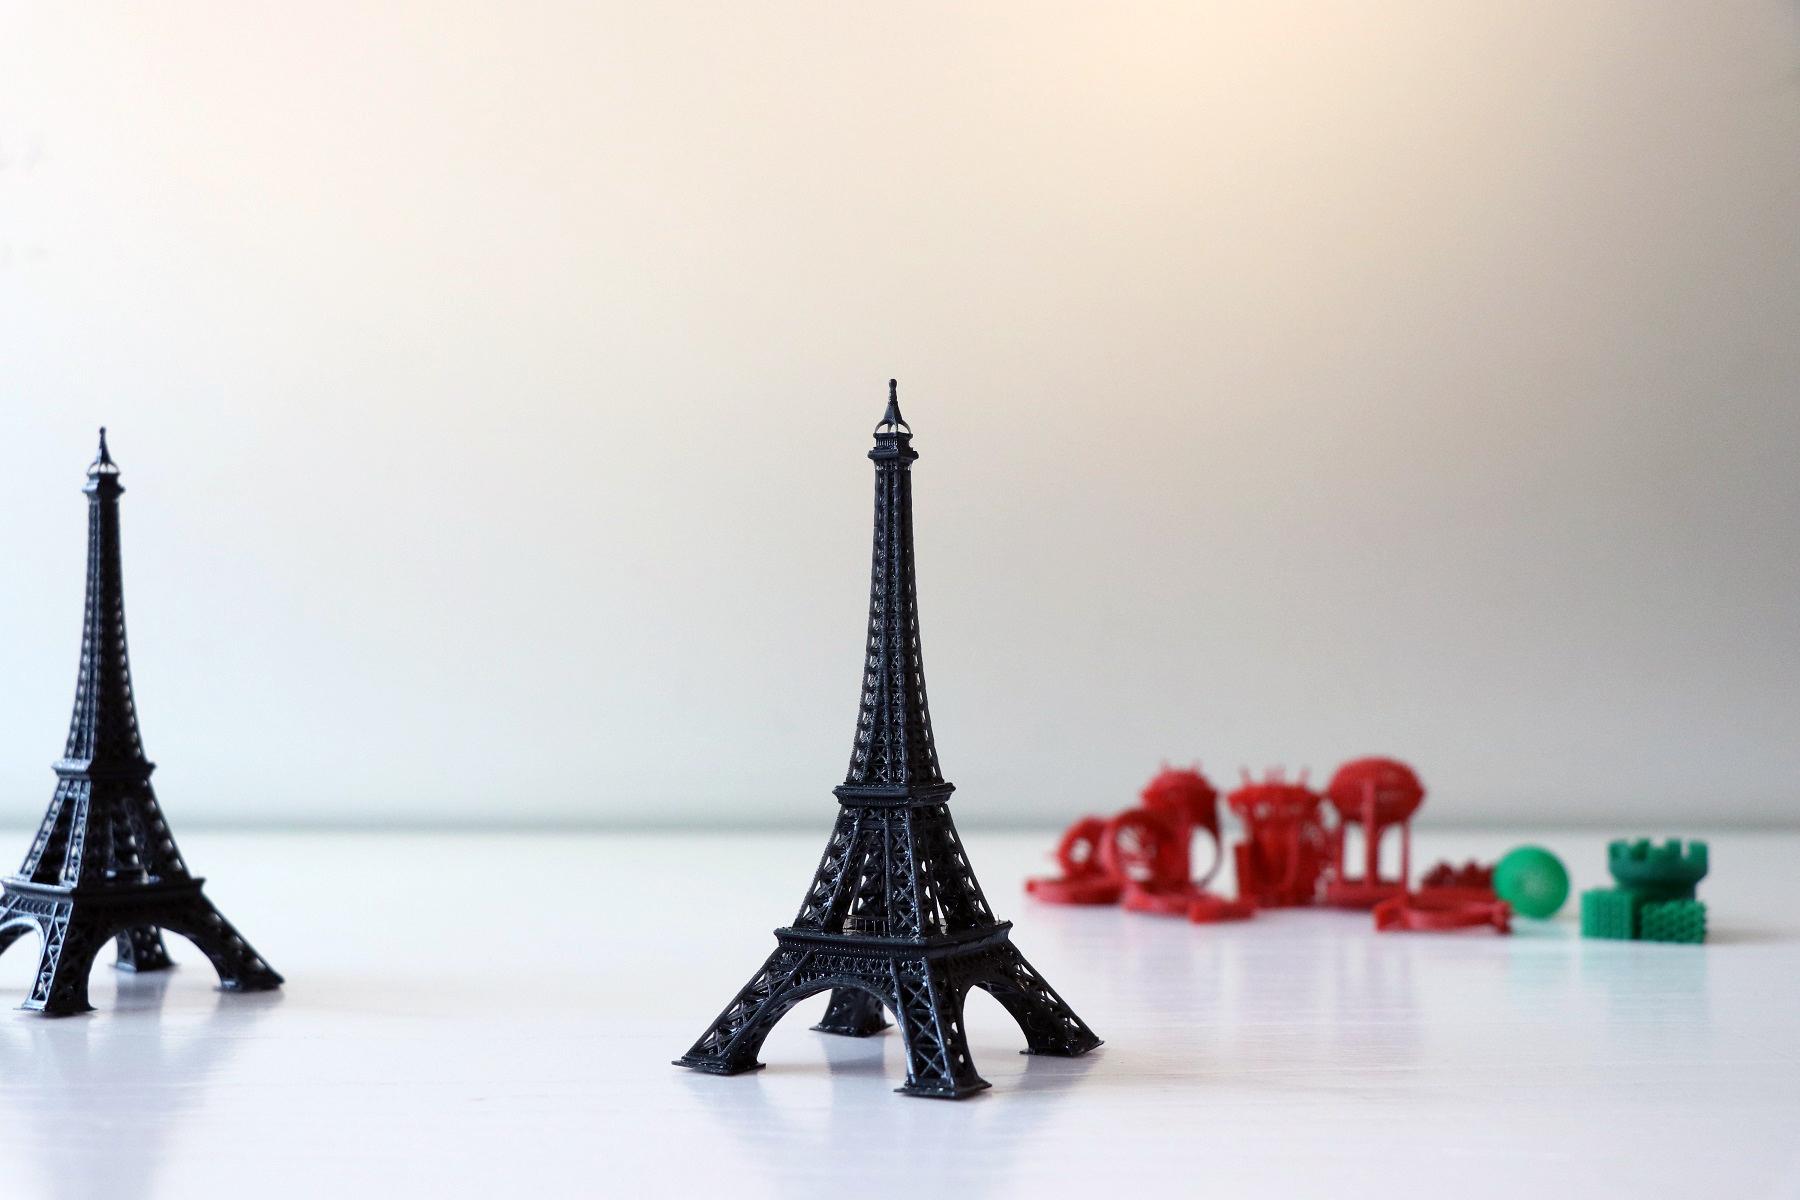 پرینت سه بعدی جواهرات